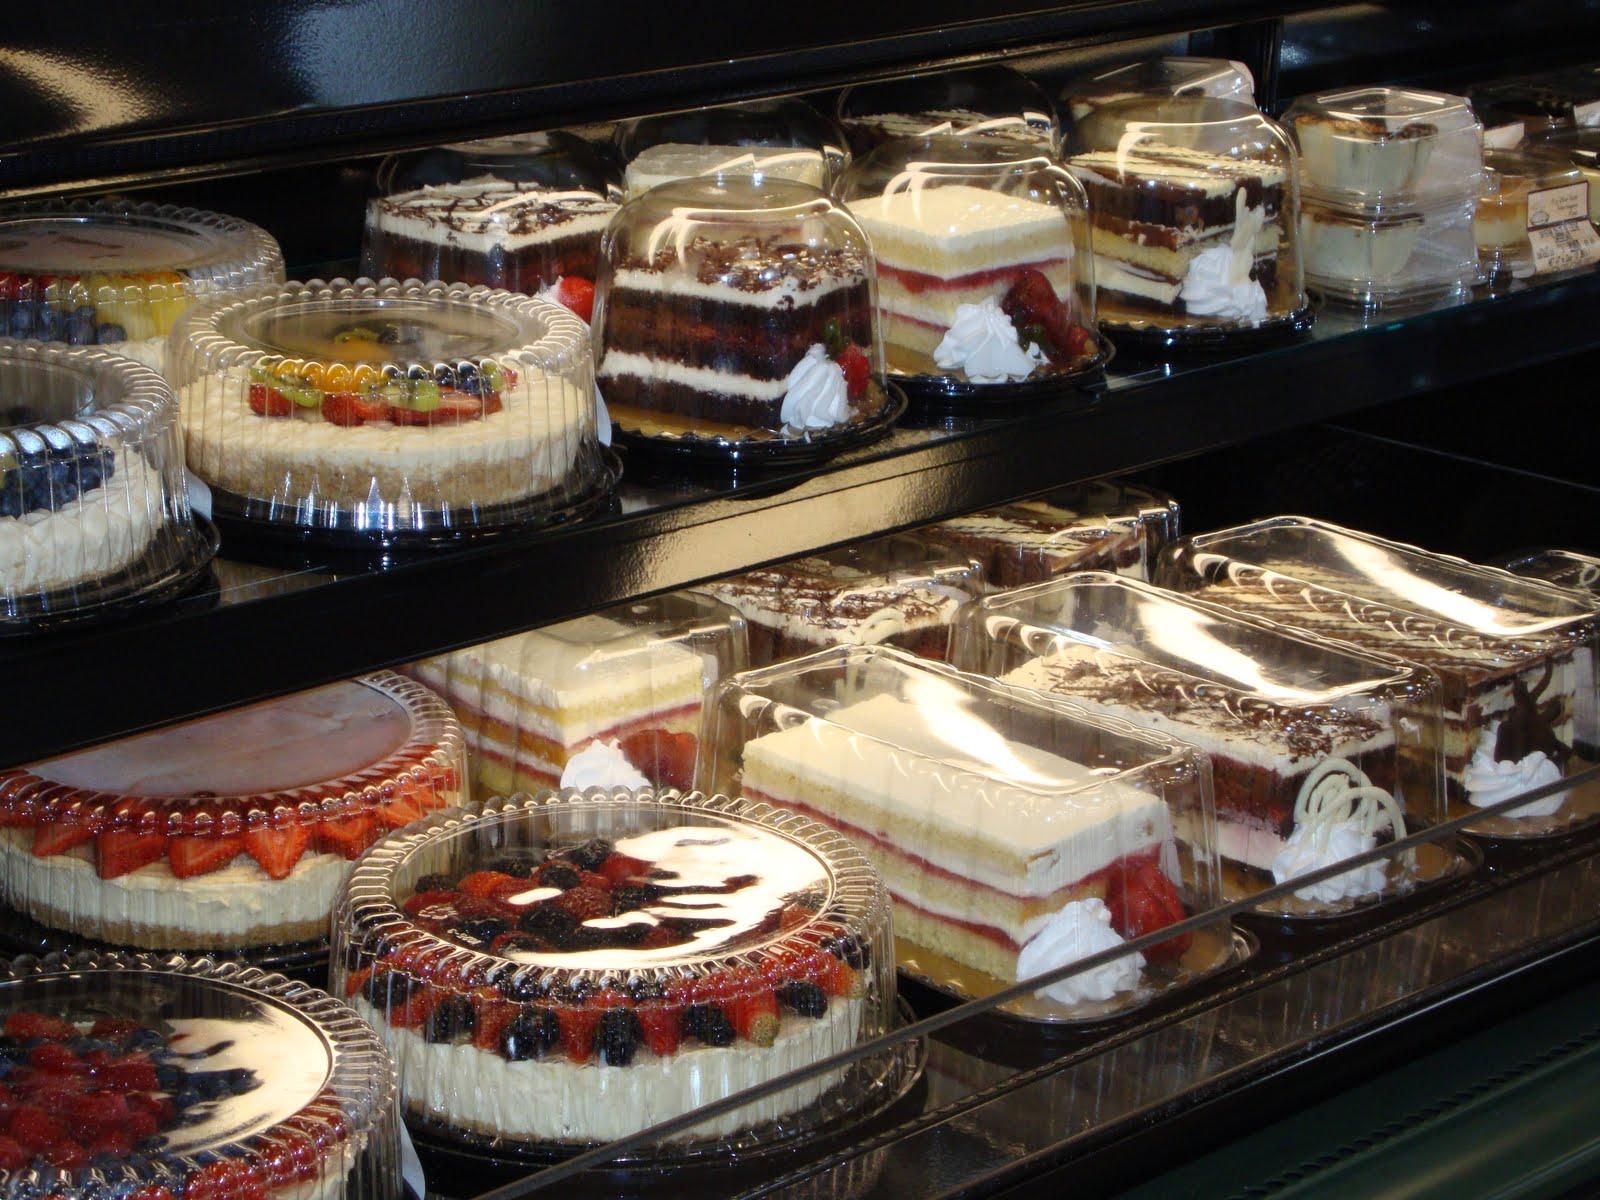 Dual Layer Dvd Kroger Bakery Cakes